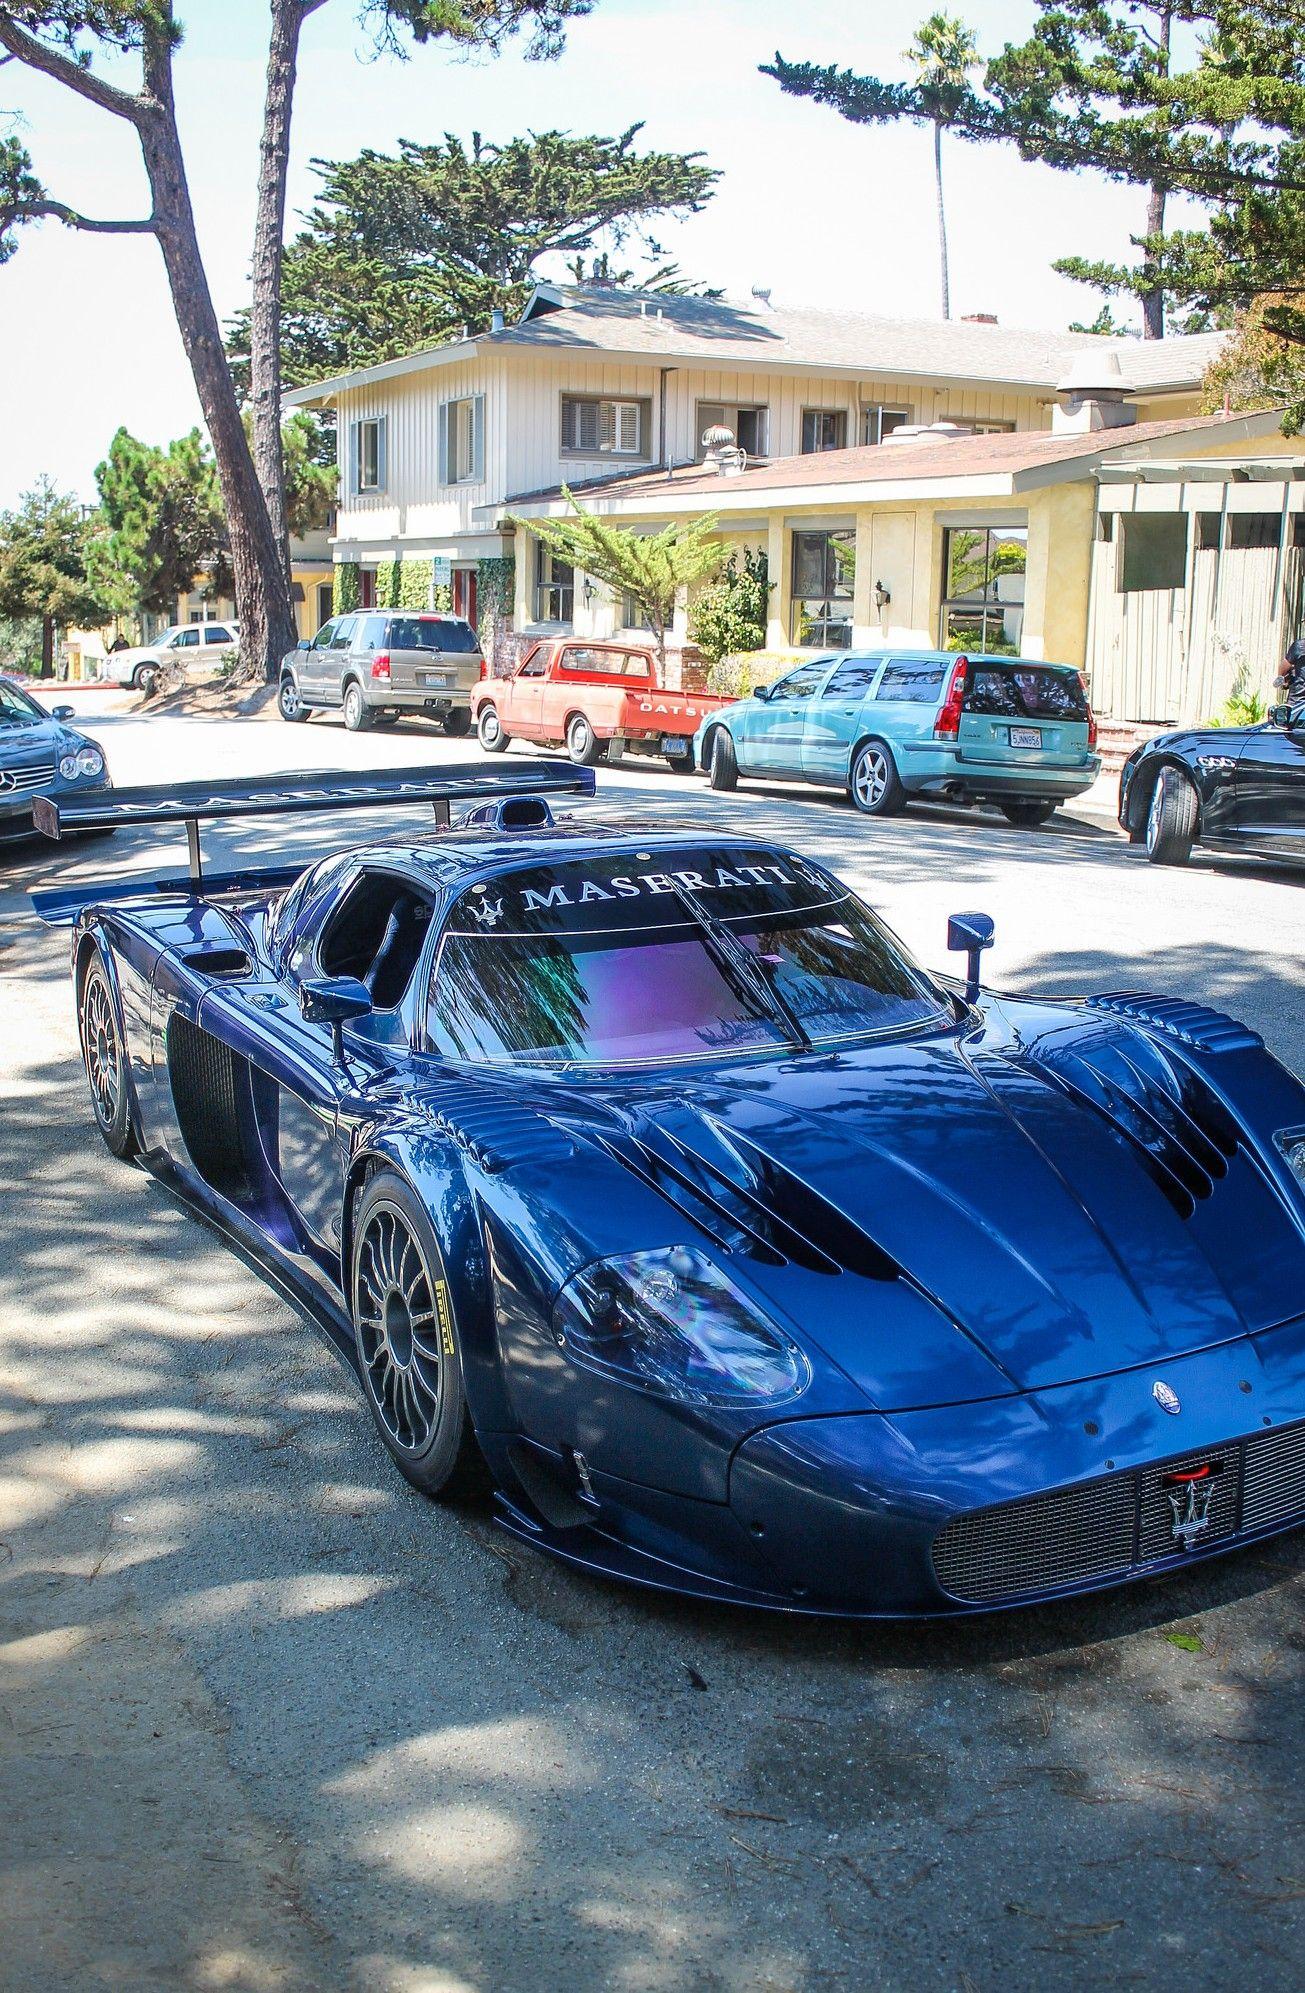 Maserati Mc12 Corsa Sure Doesn T Fit In That Neighborhood Lol スポーツカー マセラティ 伊太利亜